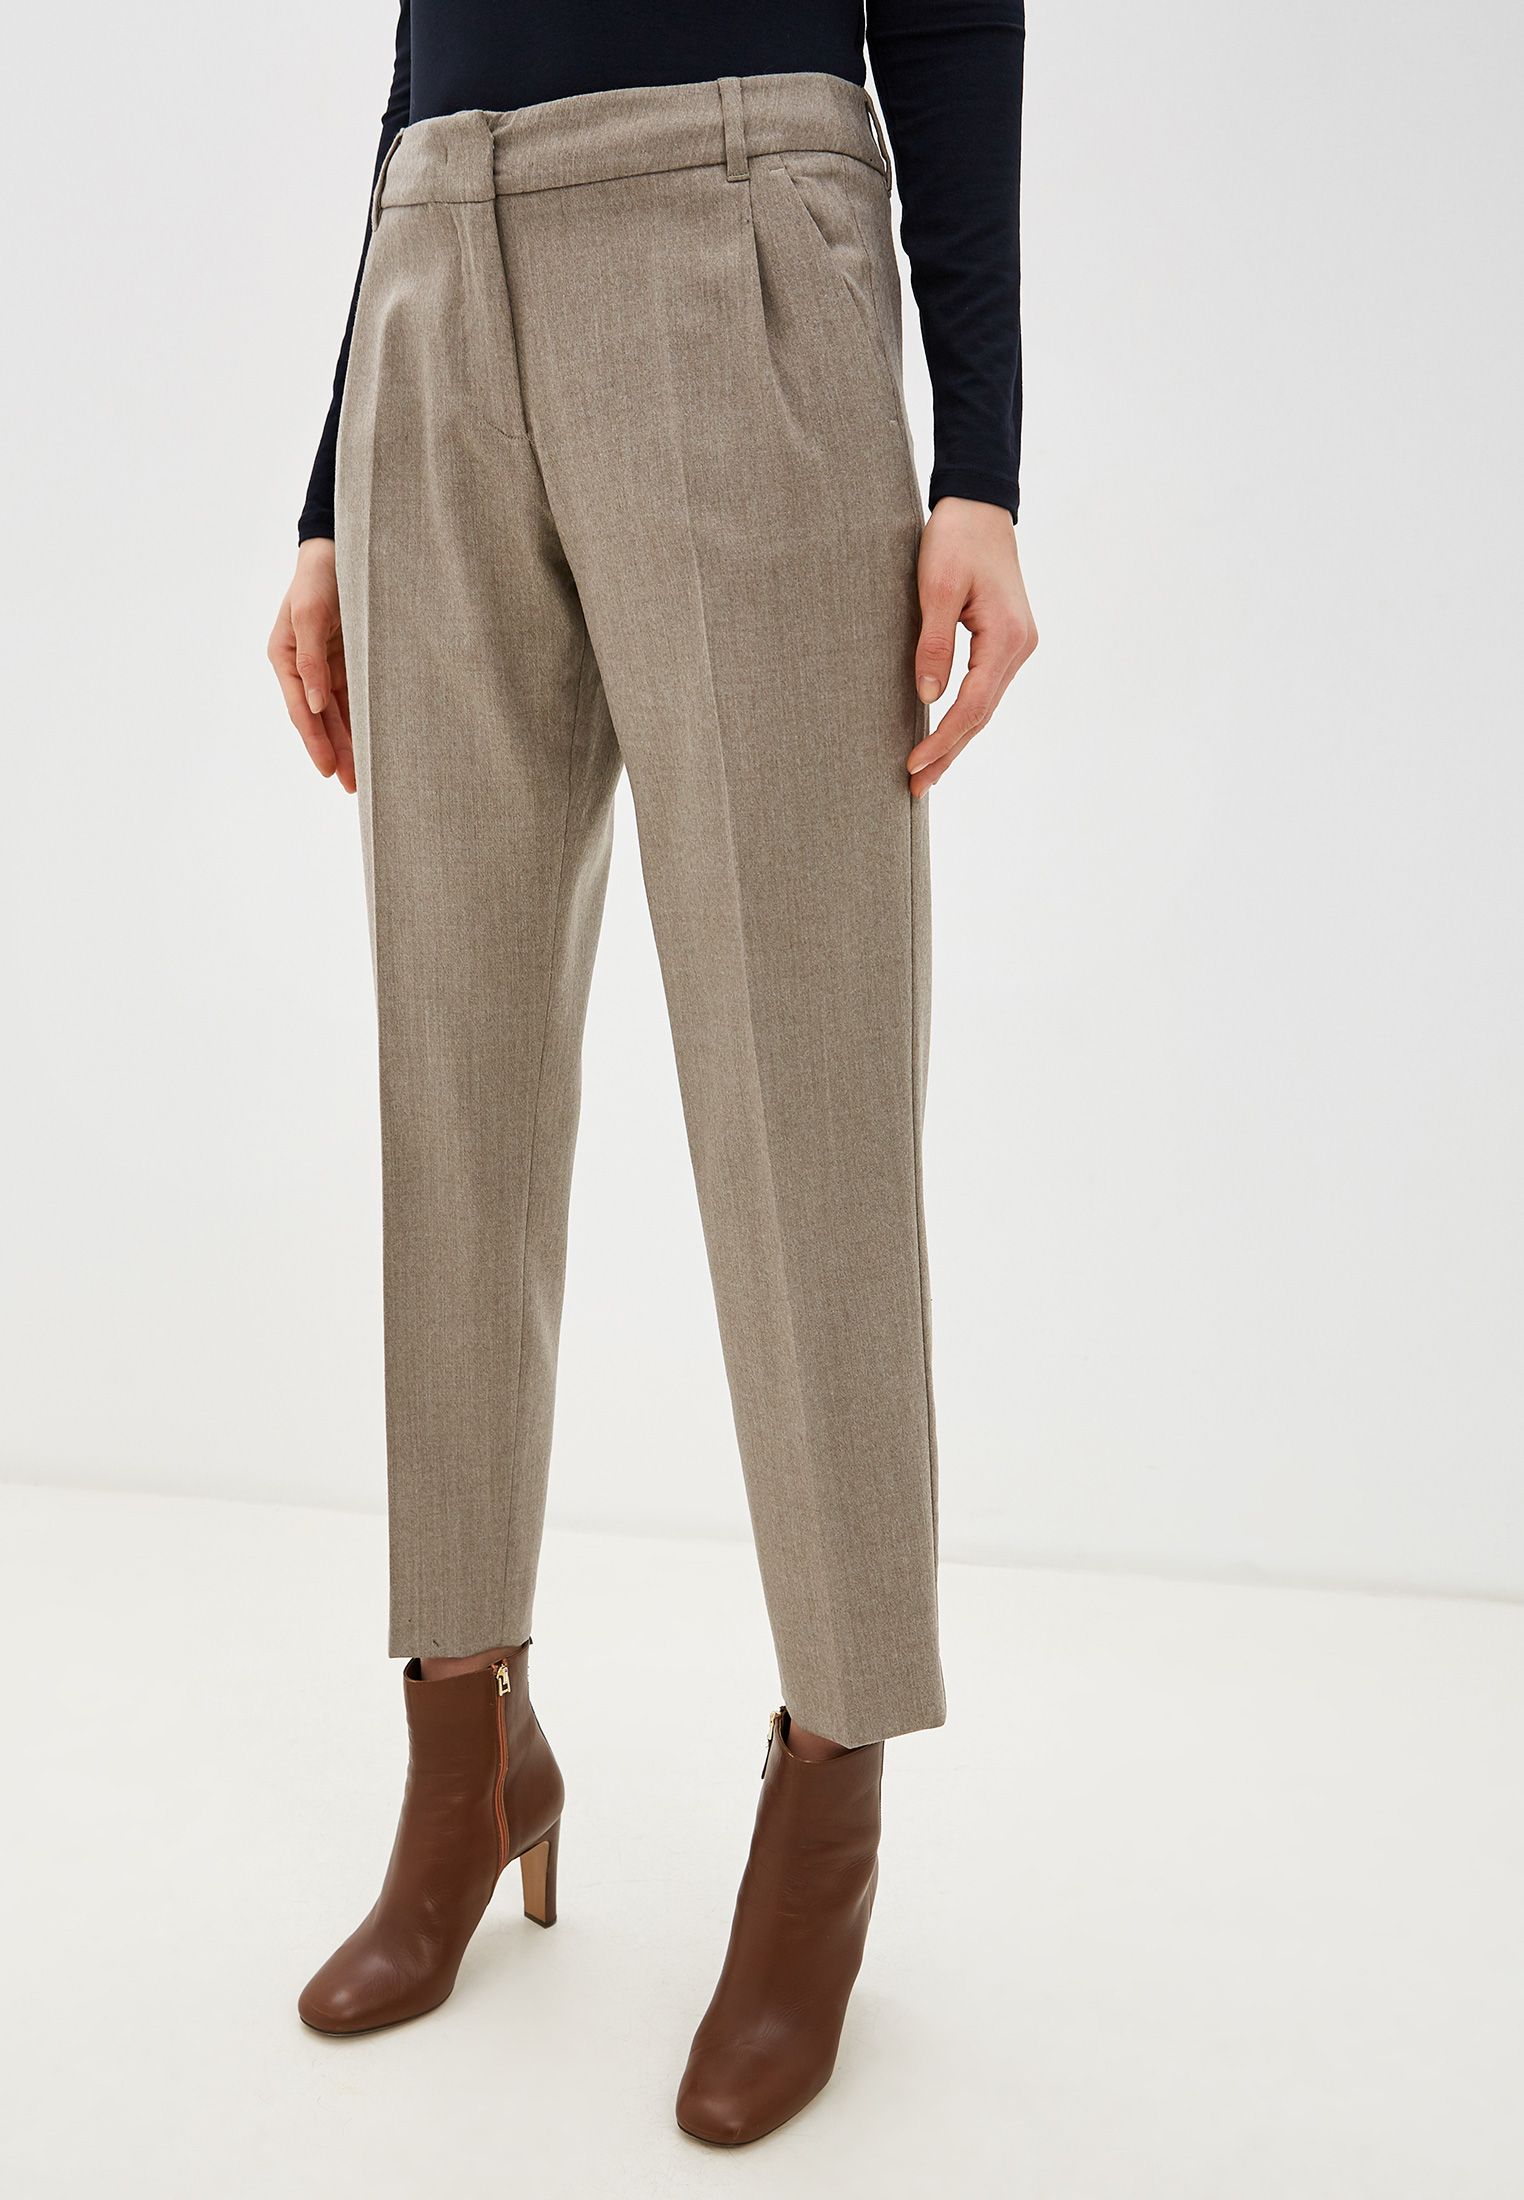 Женские классические брюки Weekend Max Mara NARVIK